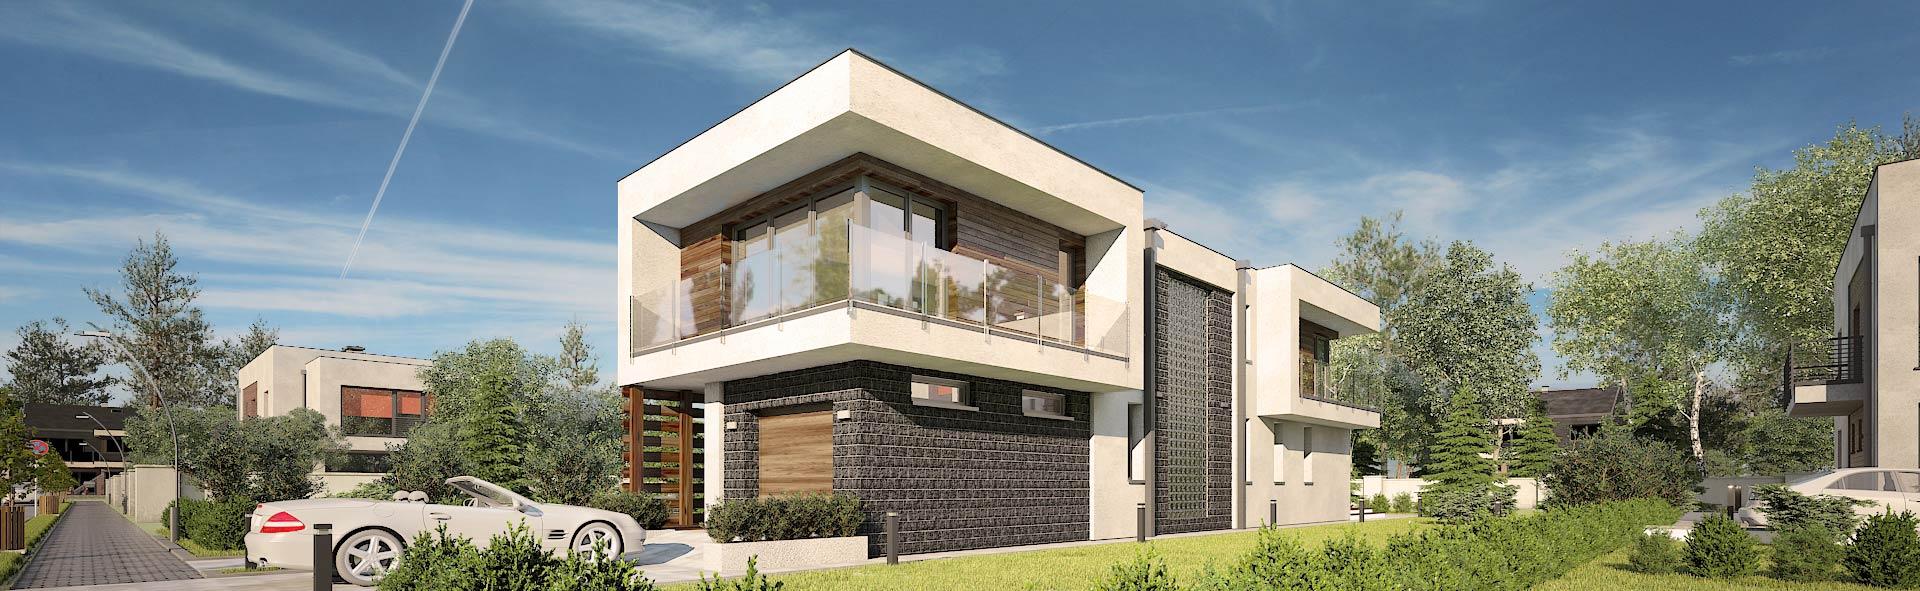 S-GL-1104-Modern-House - dzień